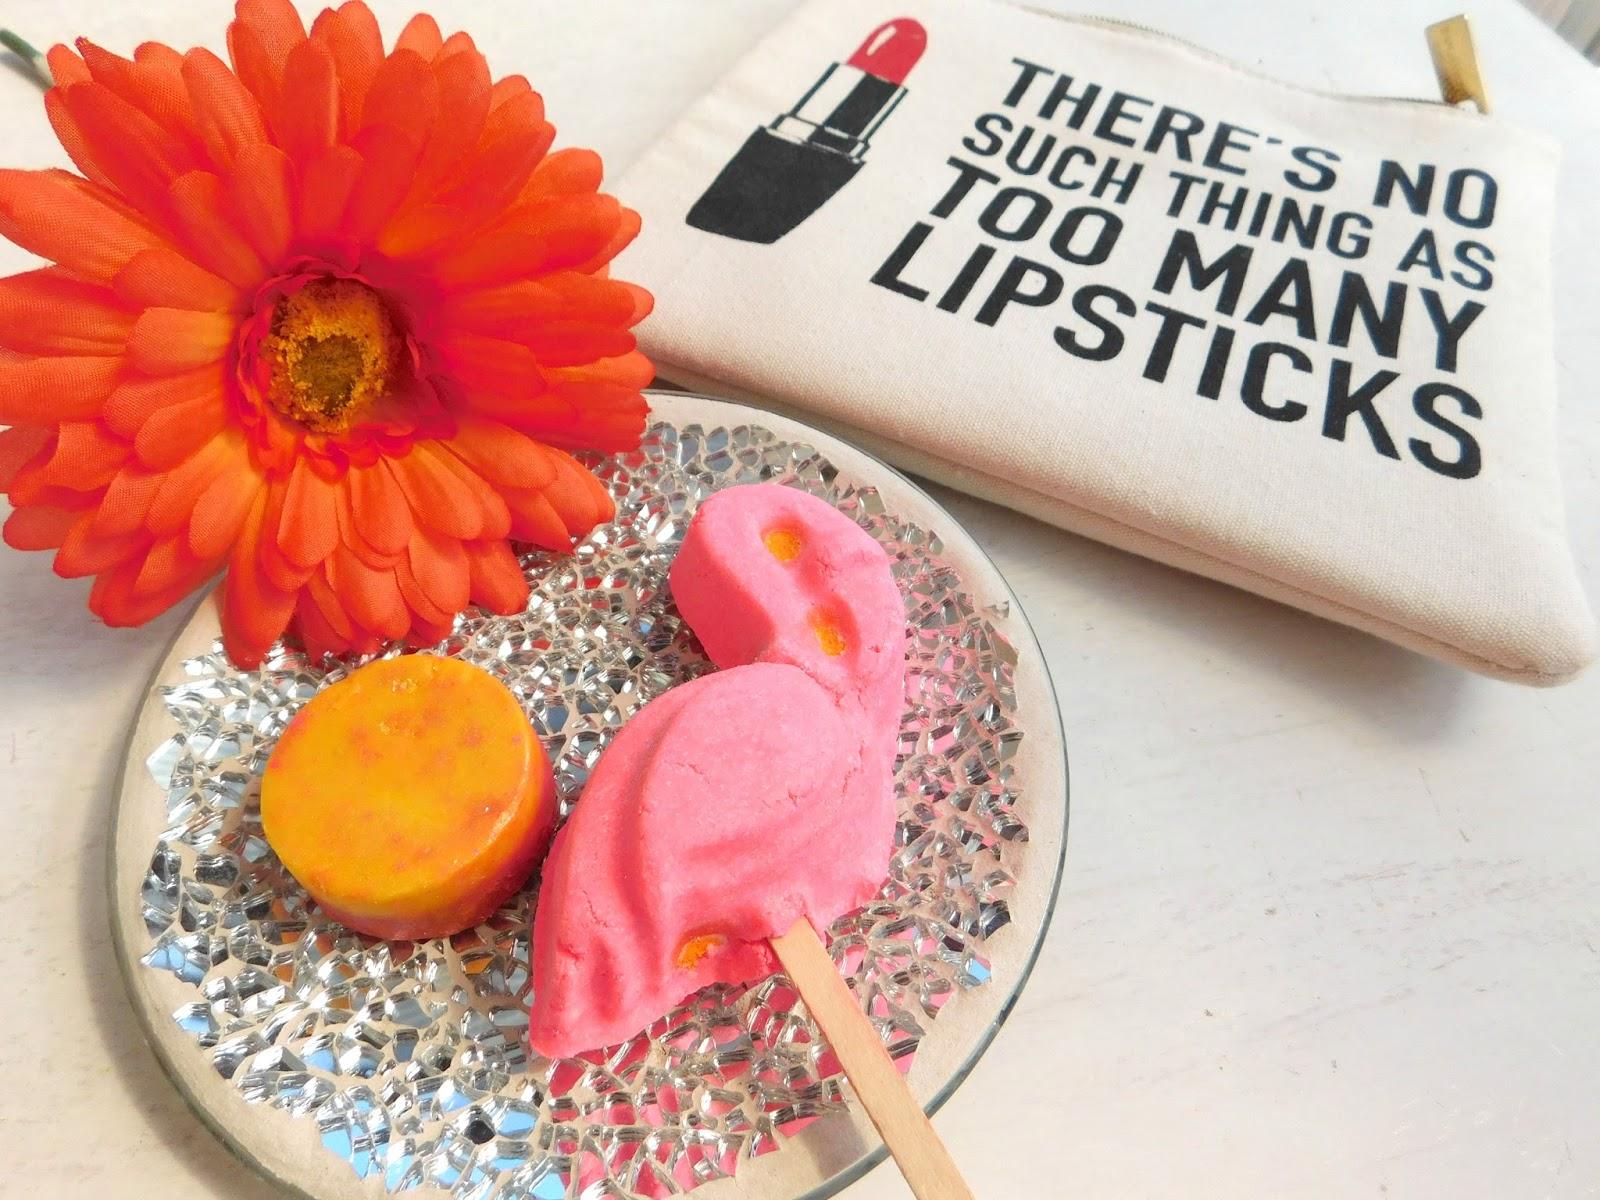 Lush Haul, Lush Favourite Products, Flamingo Lush, Marshmallow Lush, Lush Bubble Ba